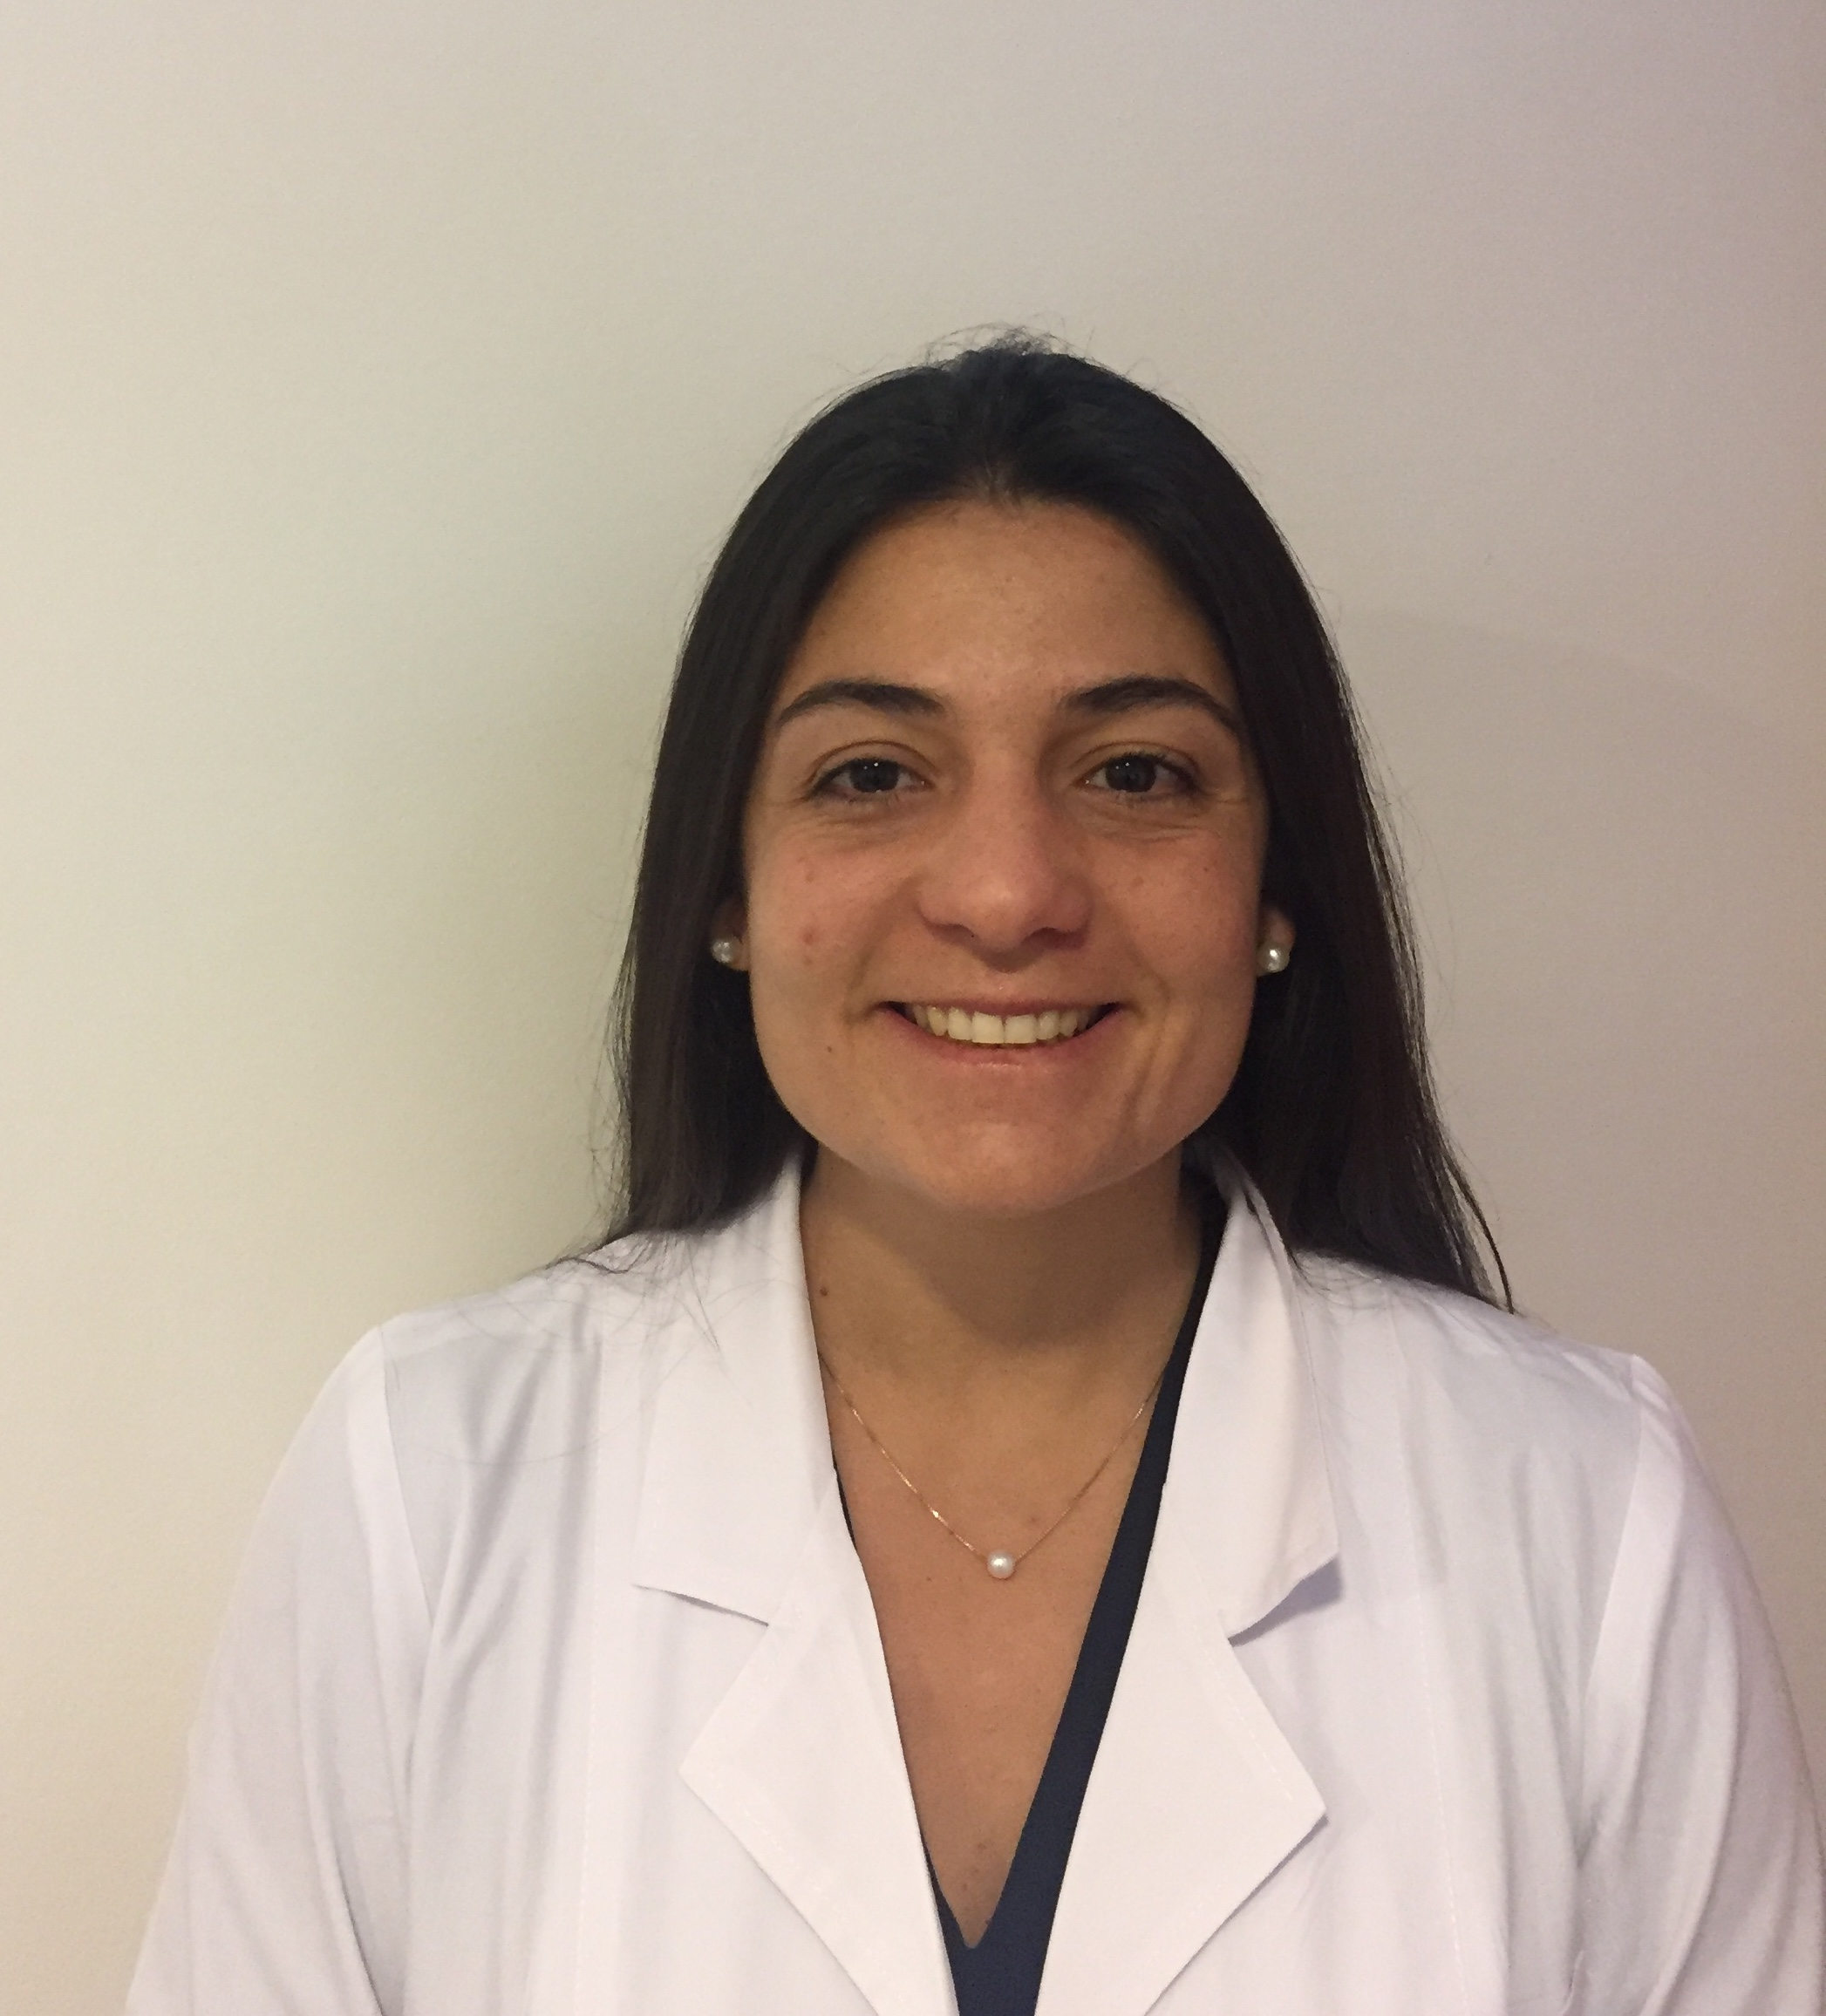 Dra. Benquet Ana